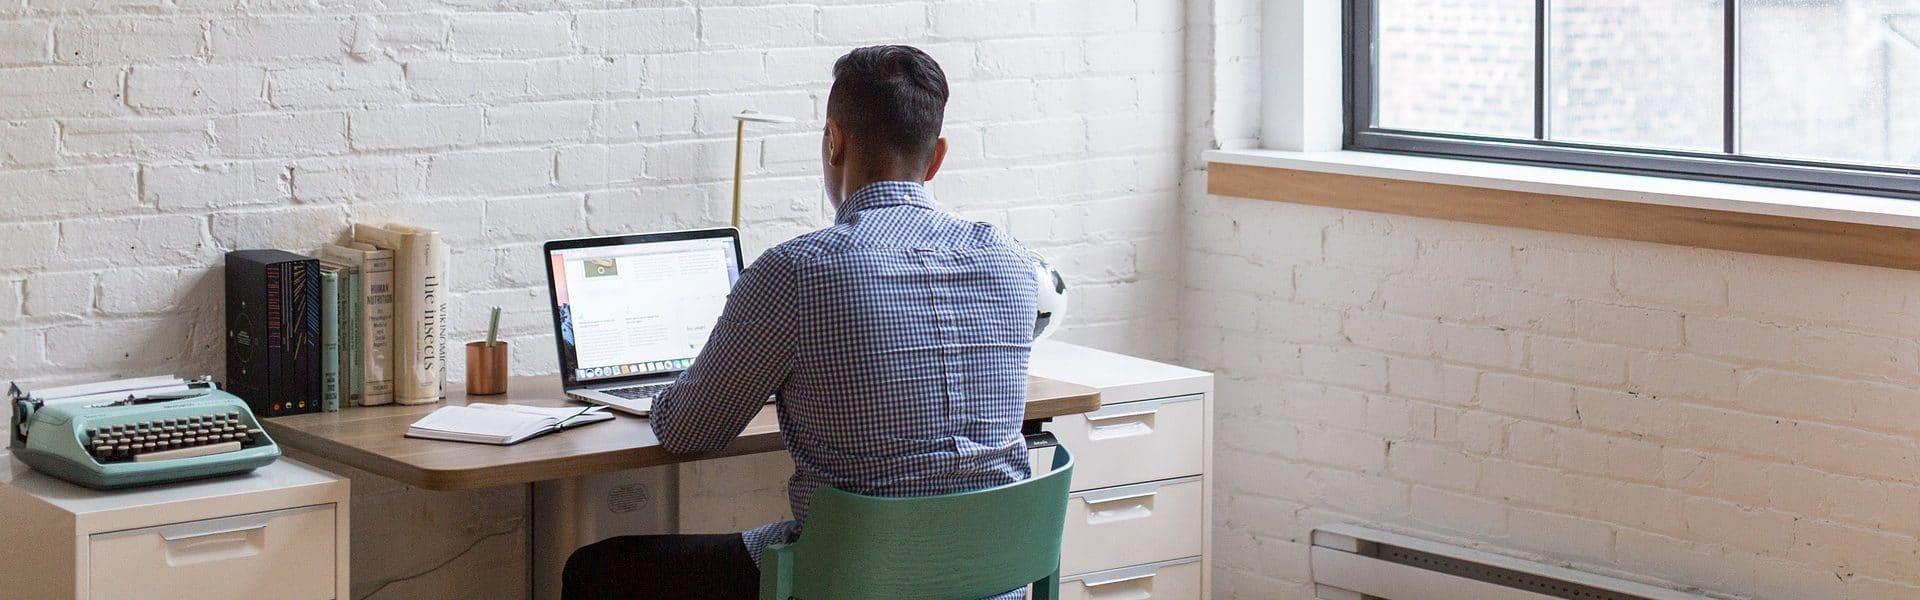 beste manier online geld verdienen